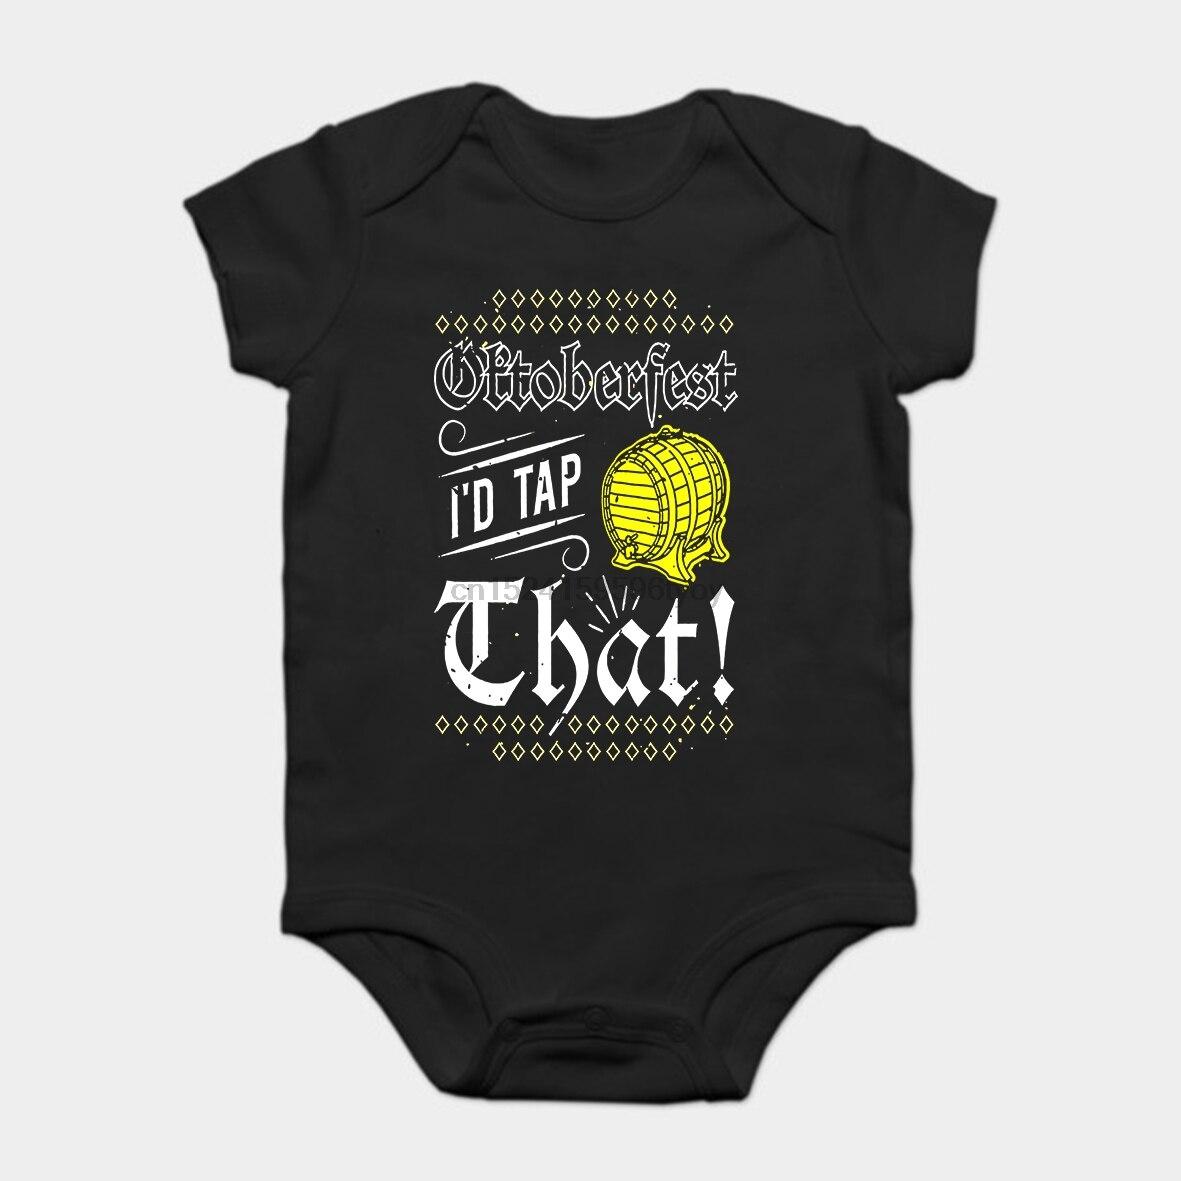 Bebé Onesie bebé Bodysuits chico camiseta Oktoberfest I d Tap que _ Octoberfest camiseta